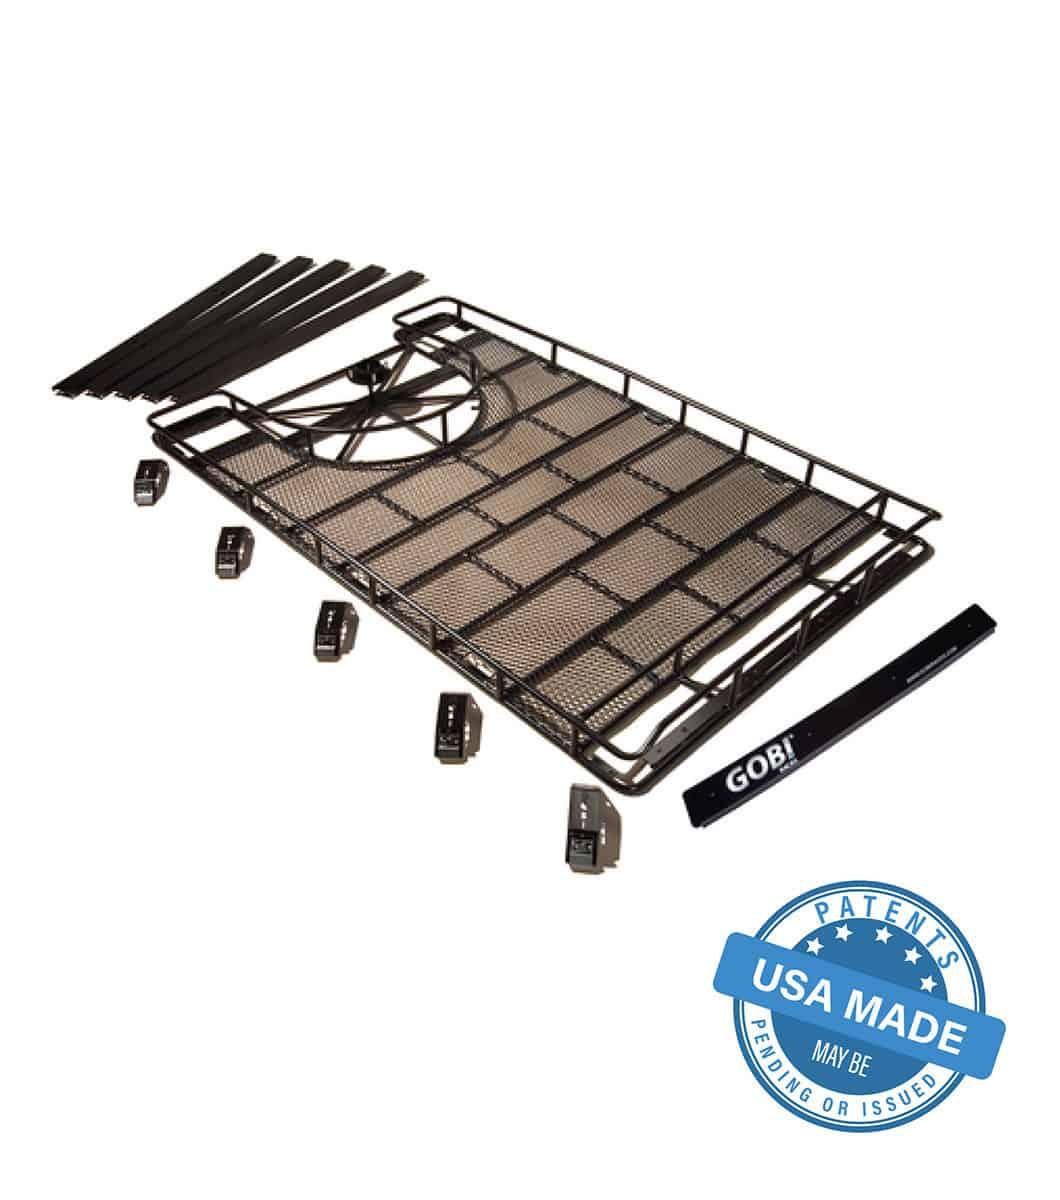 hummer h1 suv wagon ranger with tire rack multi light setup